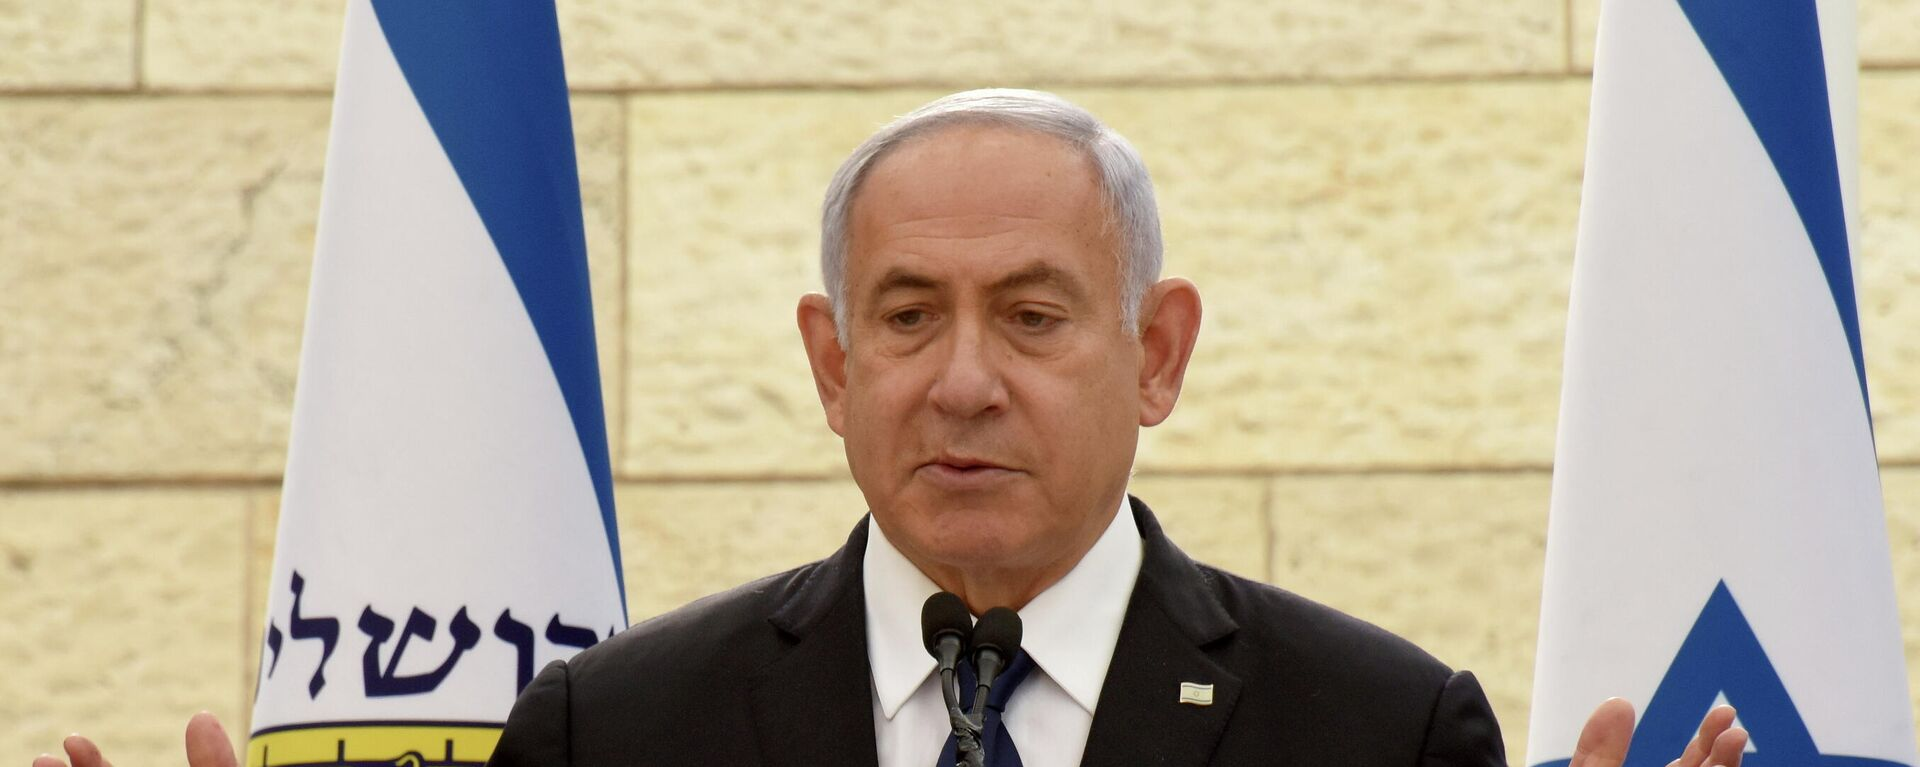 Benjamín Netanyahu, primer ministro israelí - Sputnik Mundo, 1920, 18.05.2021